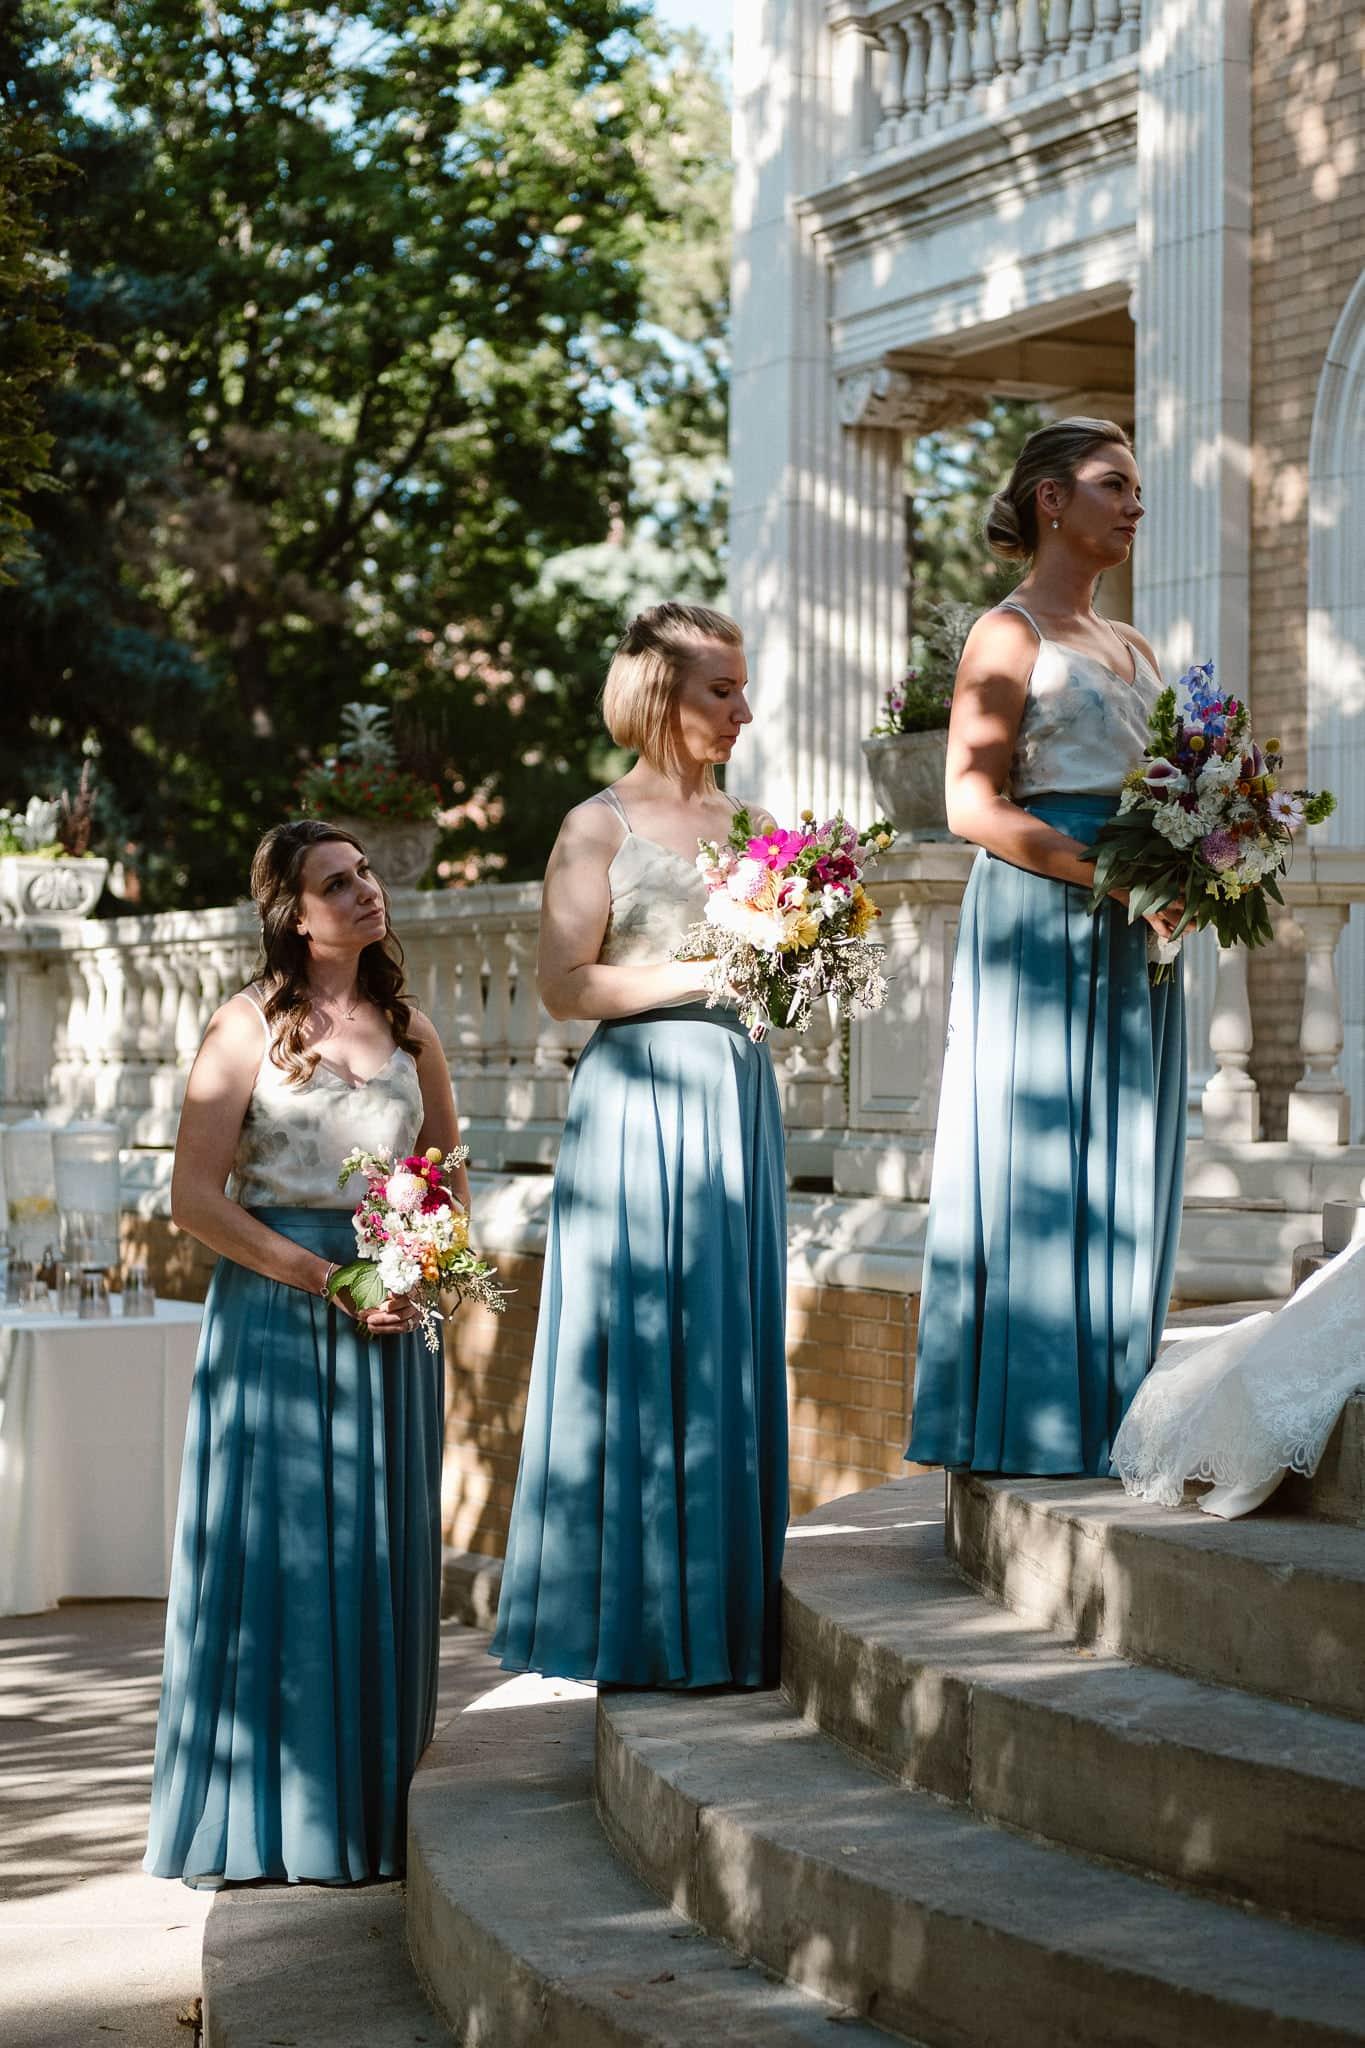 Grant Humphreys Mansion Wedding Photographer, Denver wedding photographer, Colorado wedding photographer, wedding ceremony